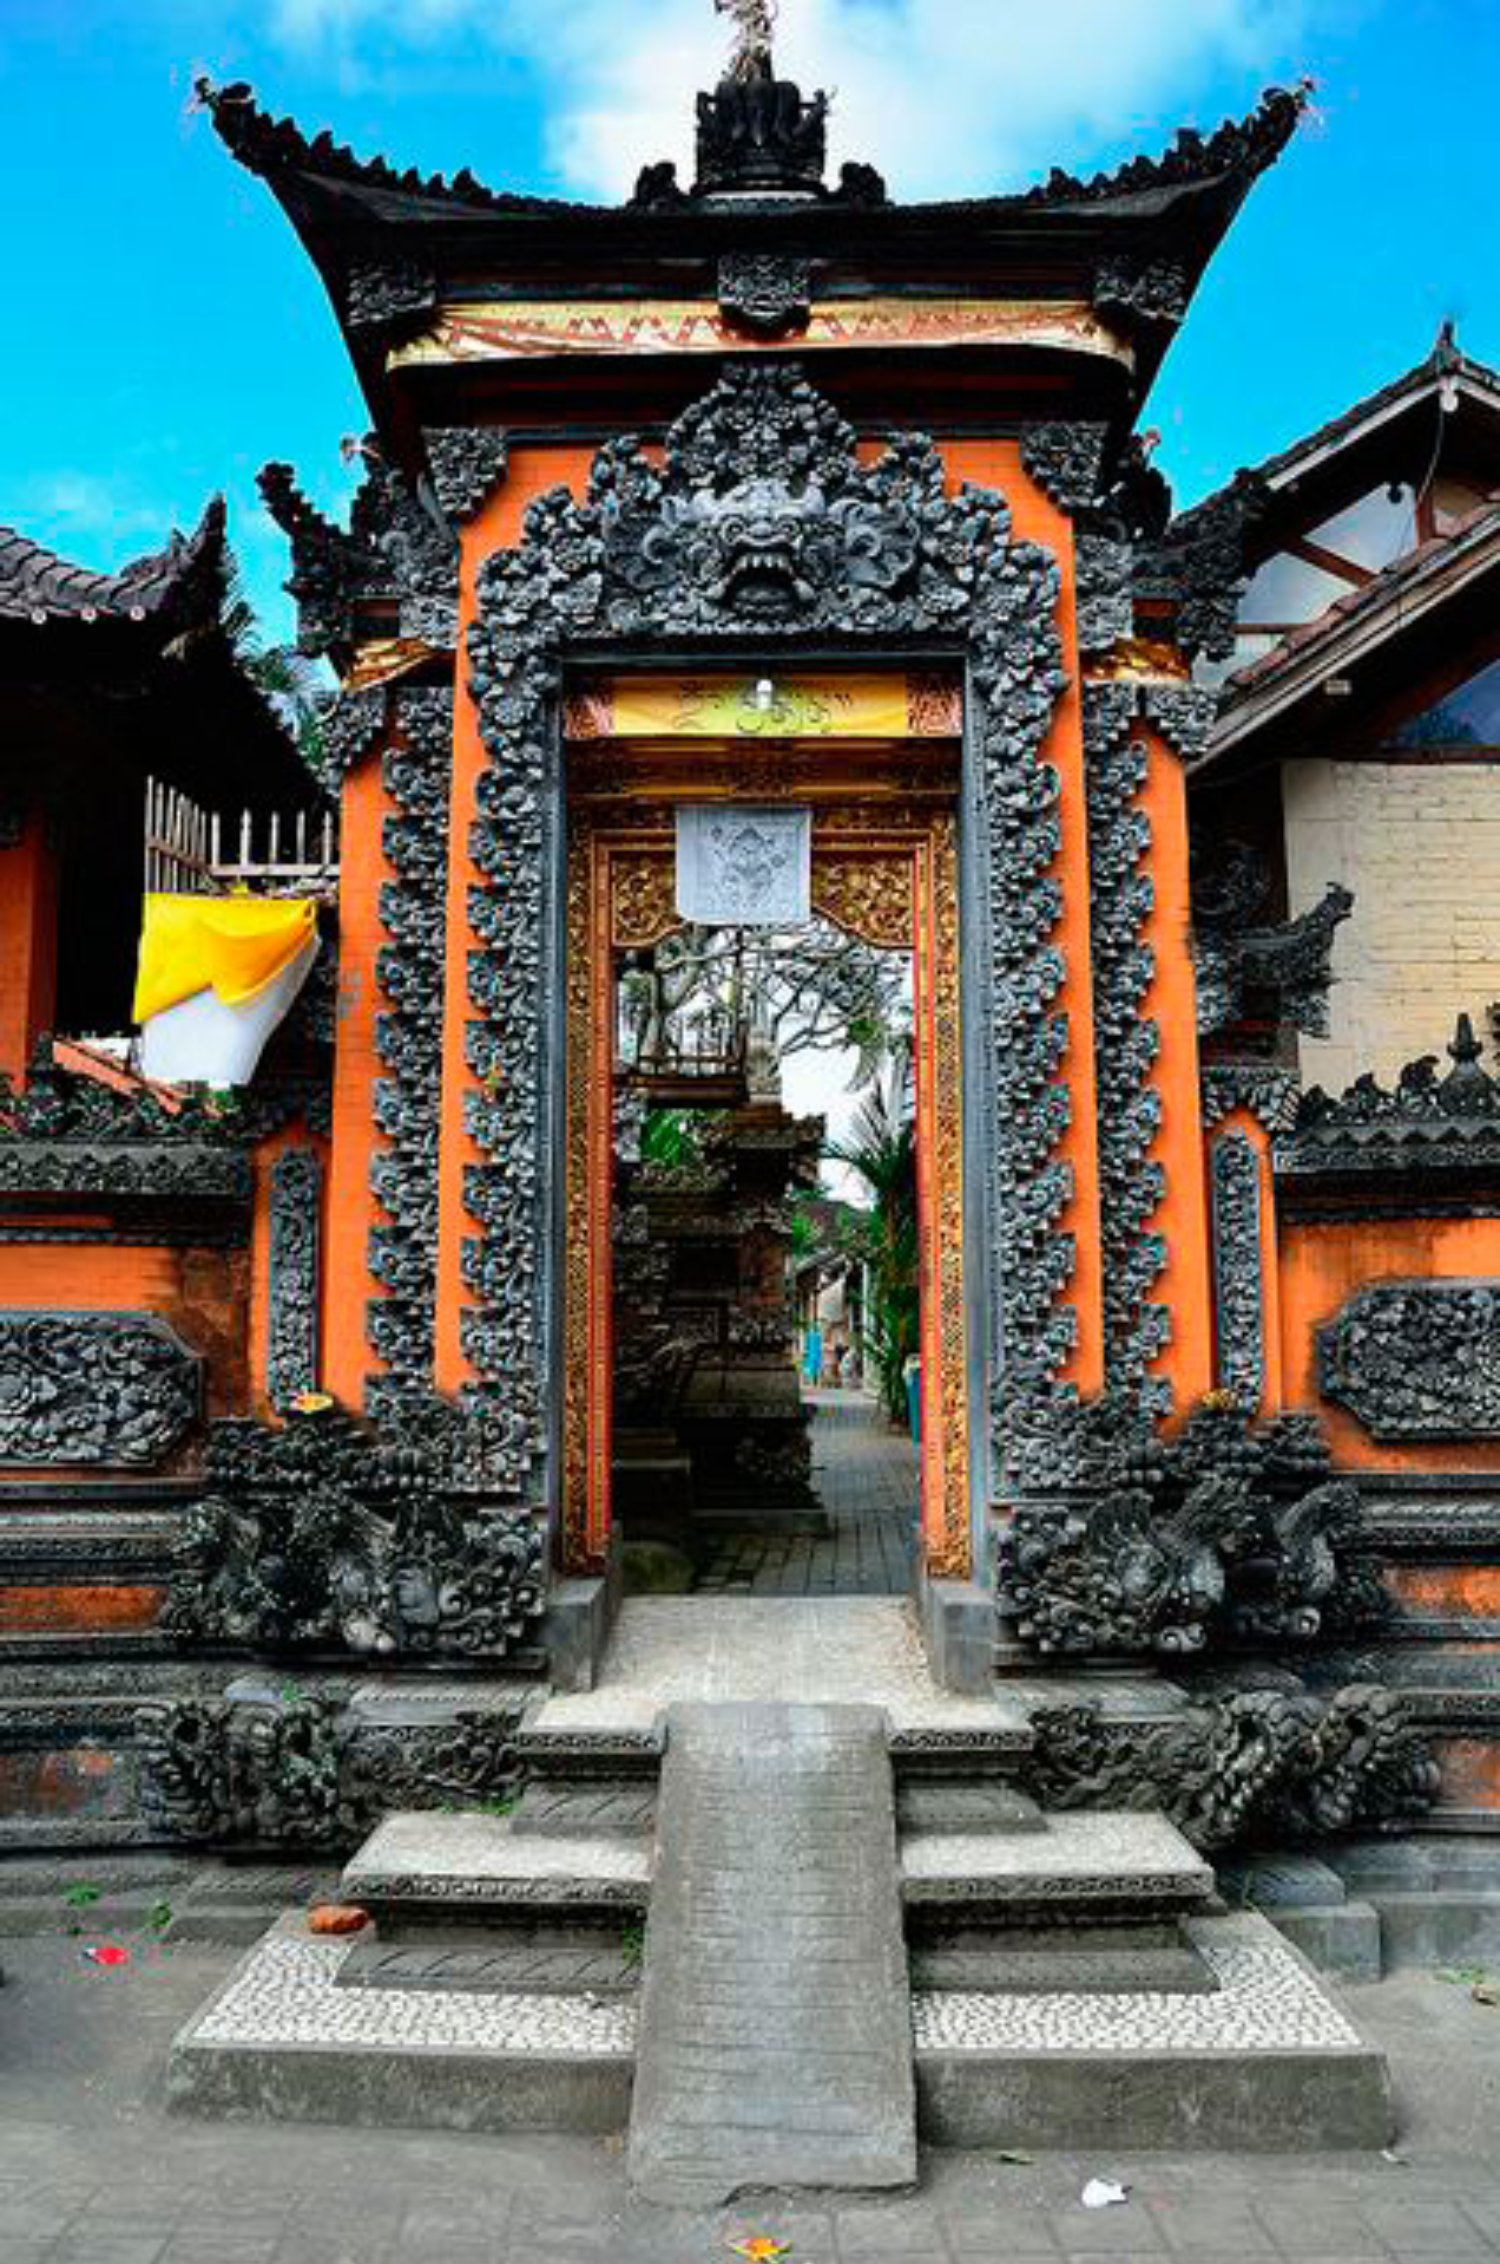 Jasa Pembuatan Angkul Angkul Style Bali Berpengalaman